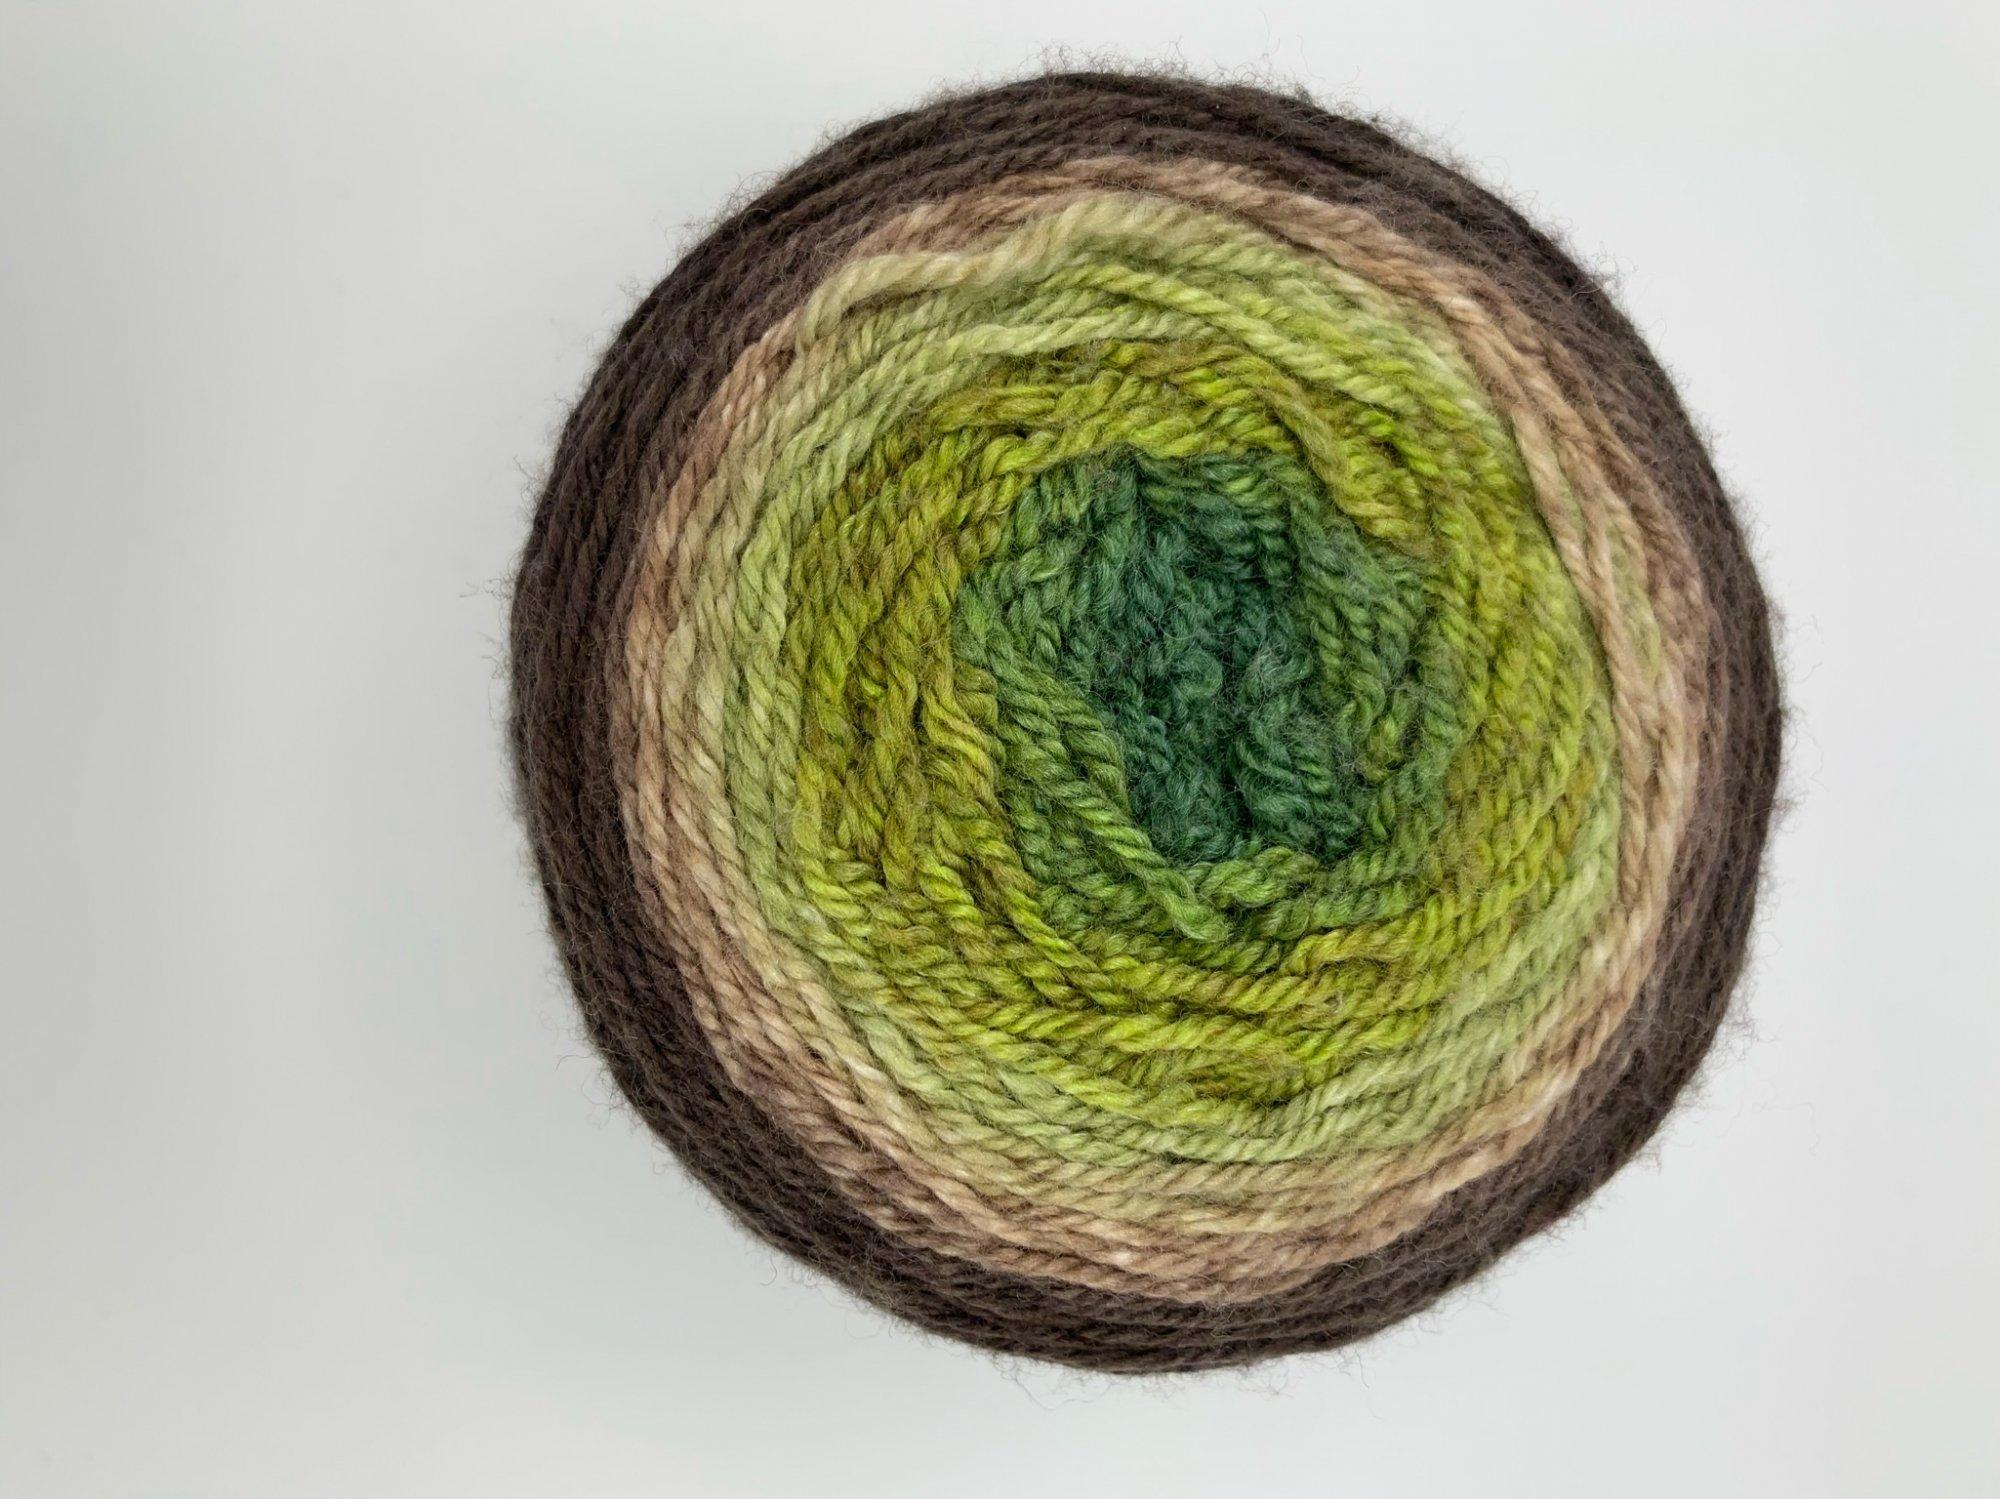 Freia Fibers - Refined Fingering Merino/Silk - Lucas